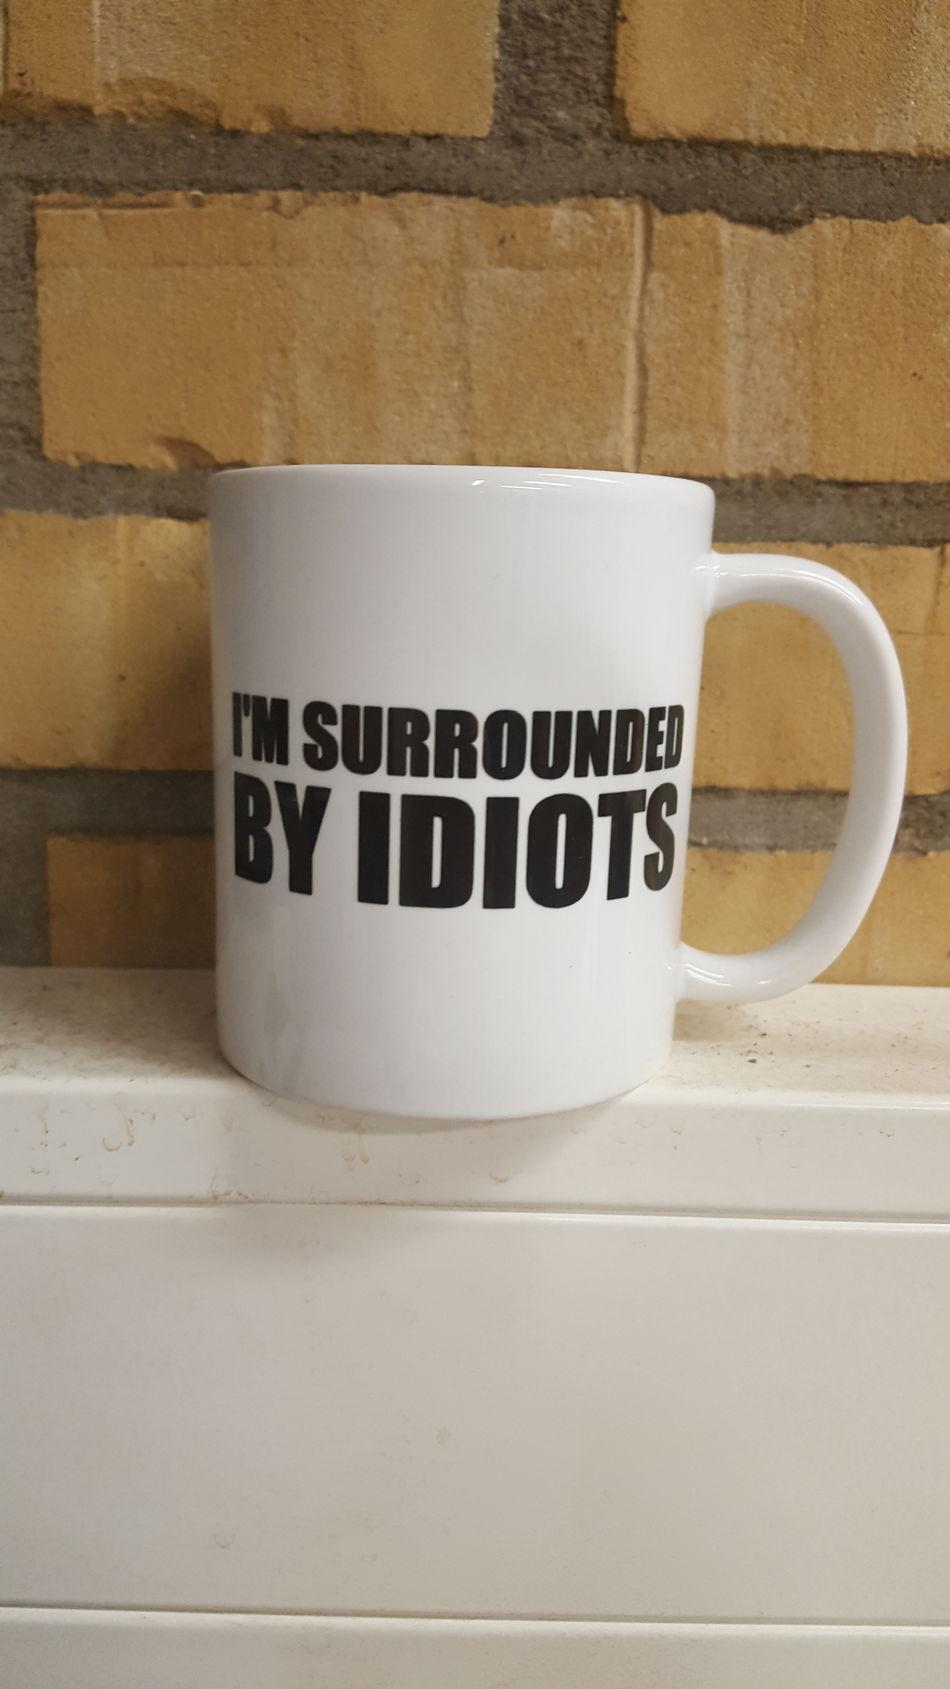 Goodmorning Koffie Koffieverkeerd Goodmorning EyeEm  Goedemorgen Idiot Idiots